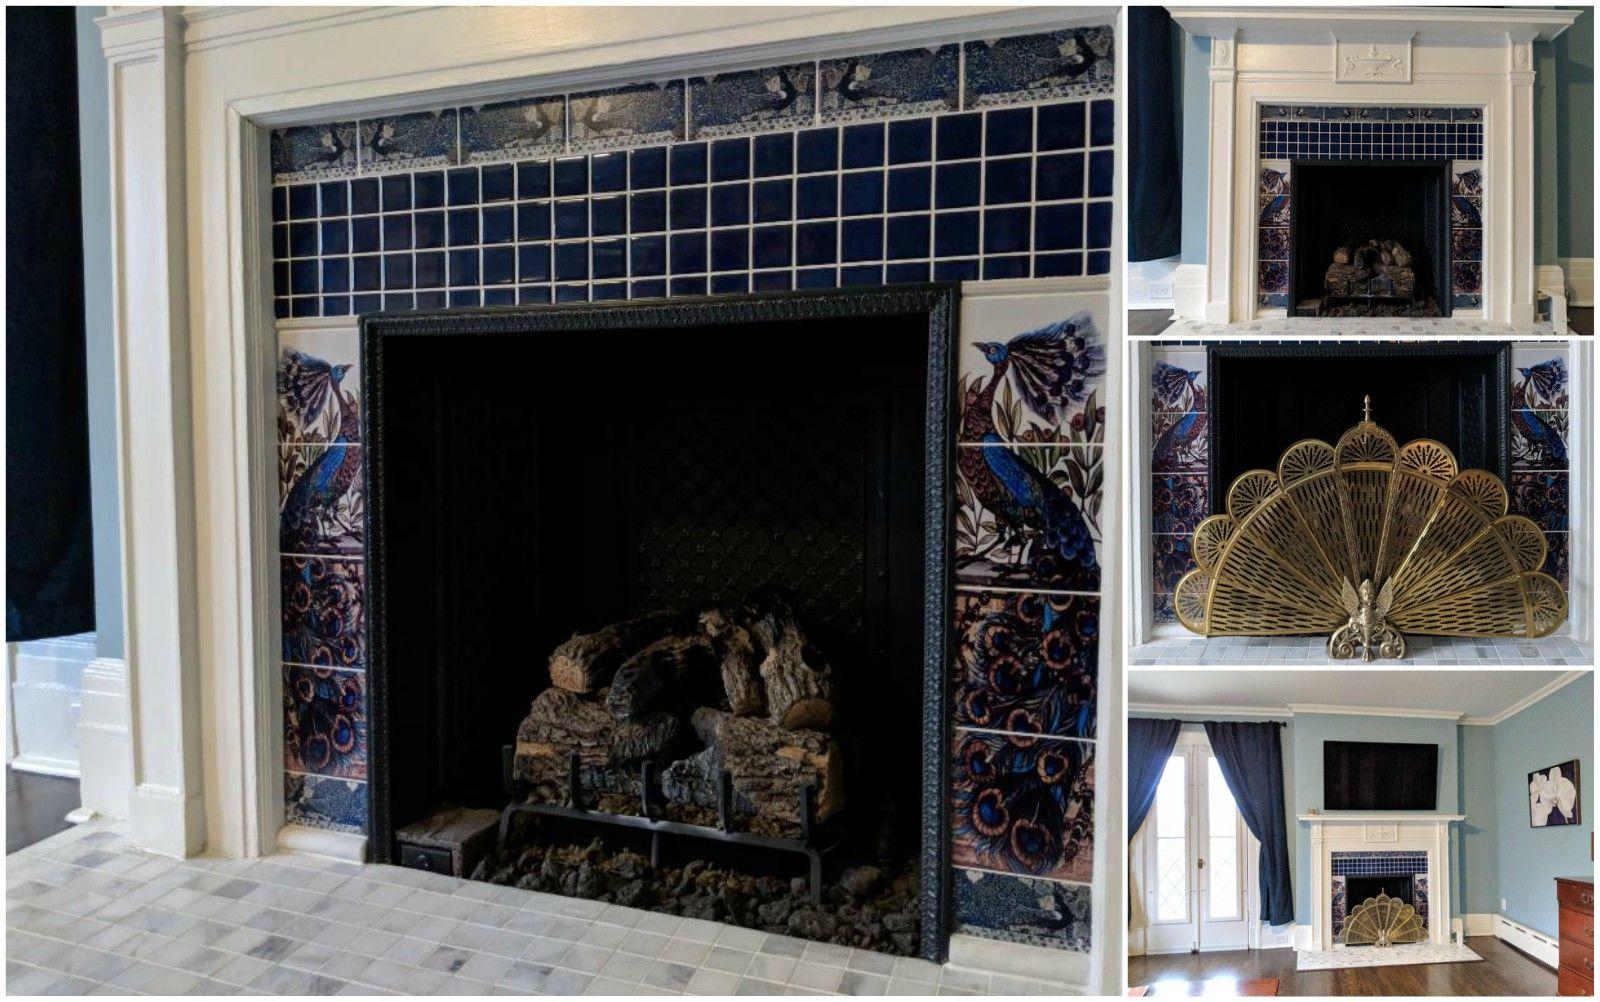 William De Morgan Pea And Salamander Paneled Fireplace With Border Tiles Williammorristile